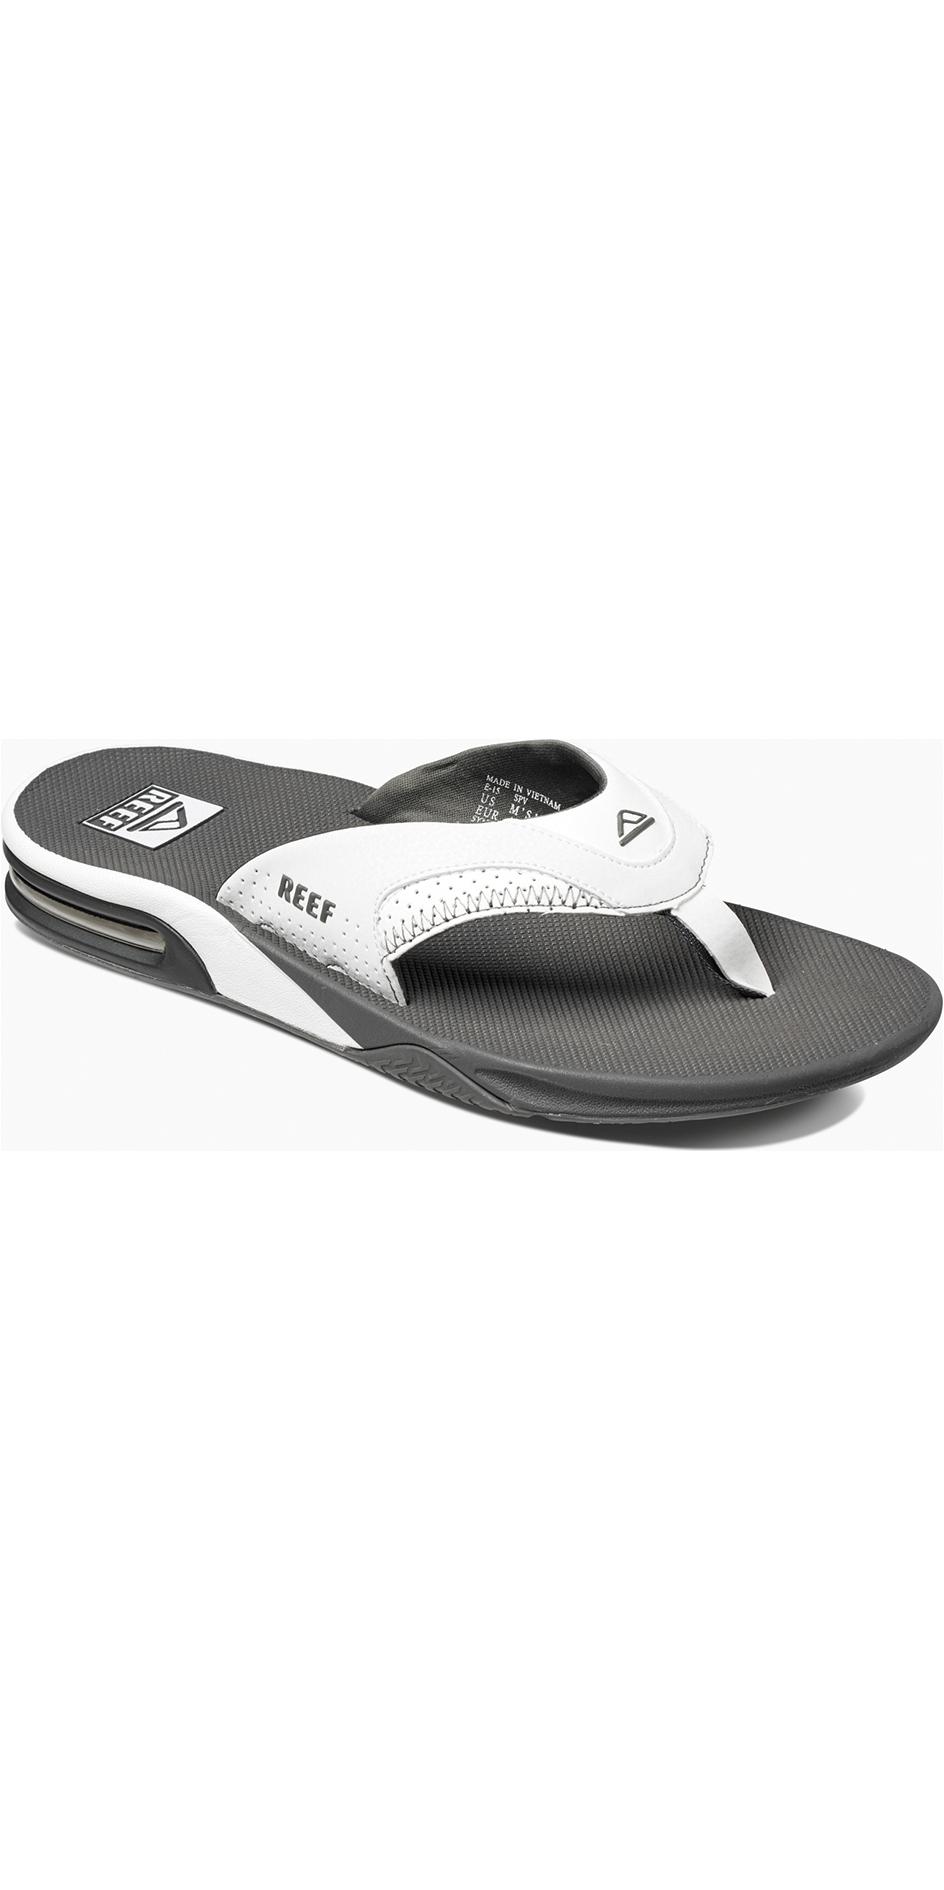 2c0122c15d27 Reef Mens Fanning Flip Flops Grey White RF002026